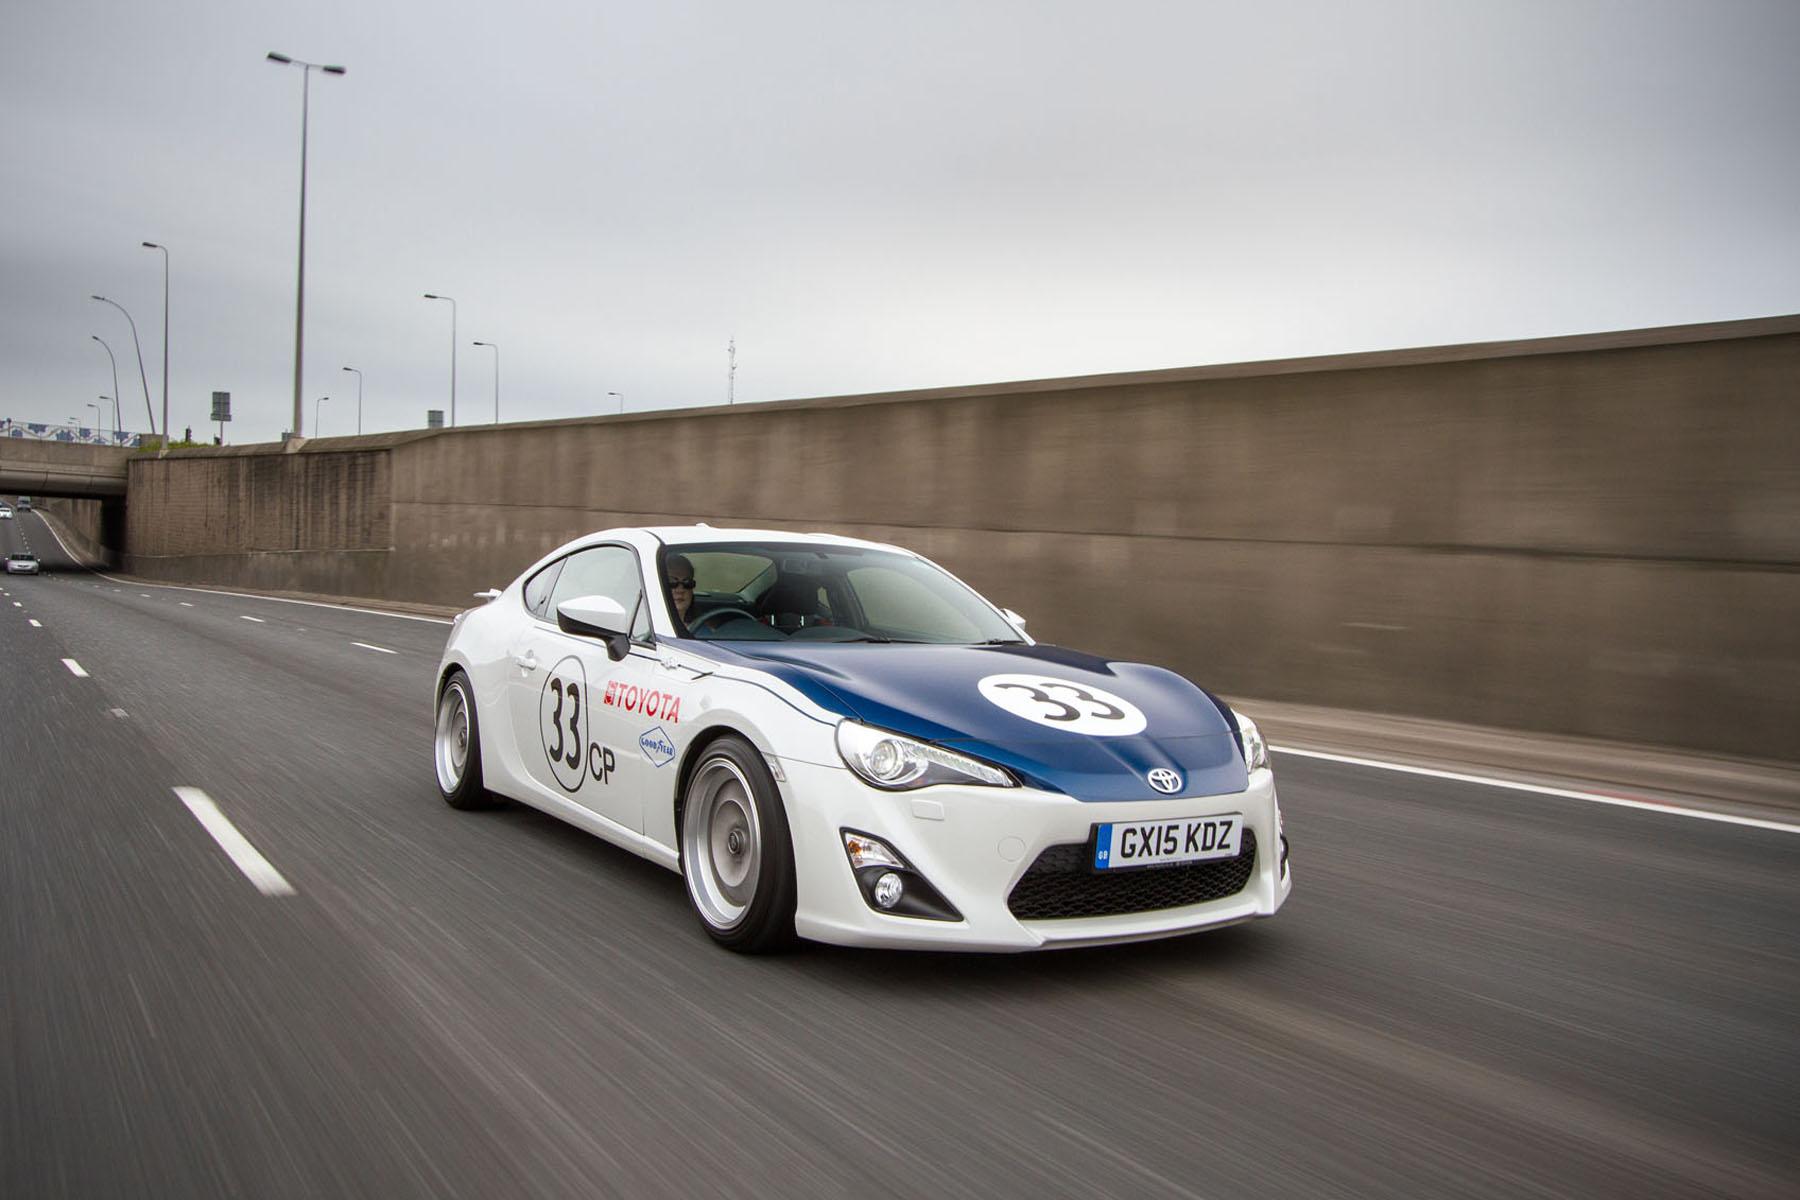 RETRO LOVE AFFAIR FOR THIS TOYOTA Used Cars NI Blog - Sports cars ni